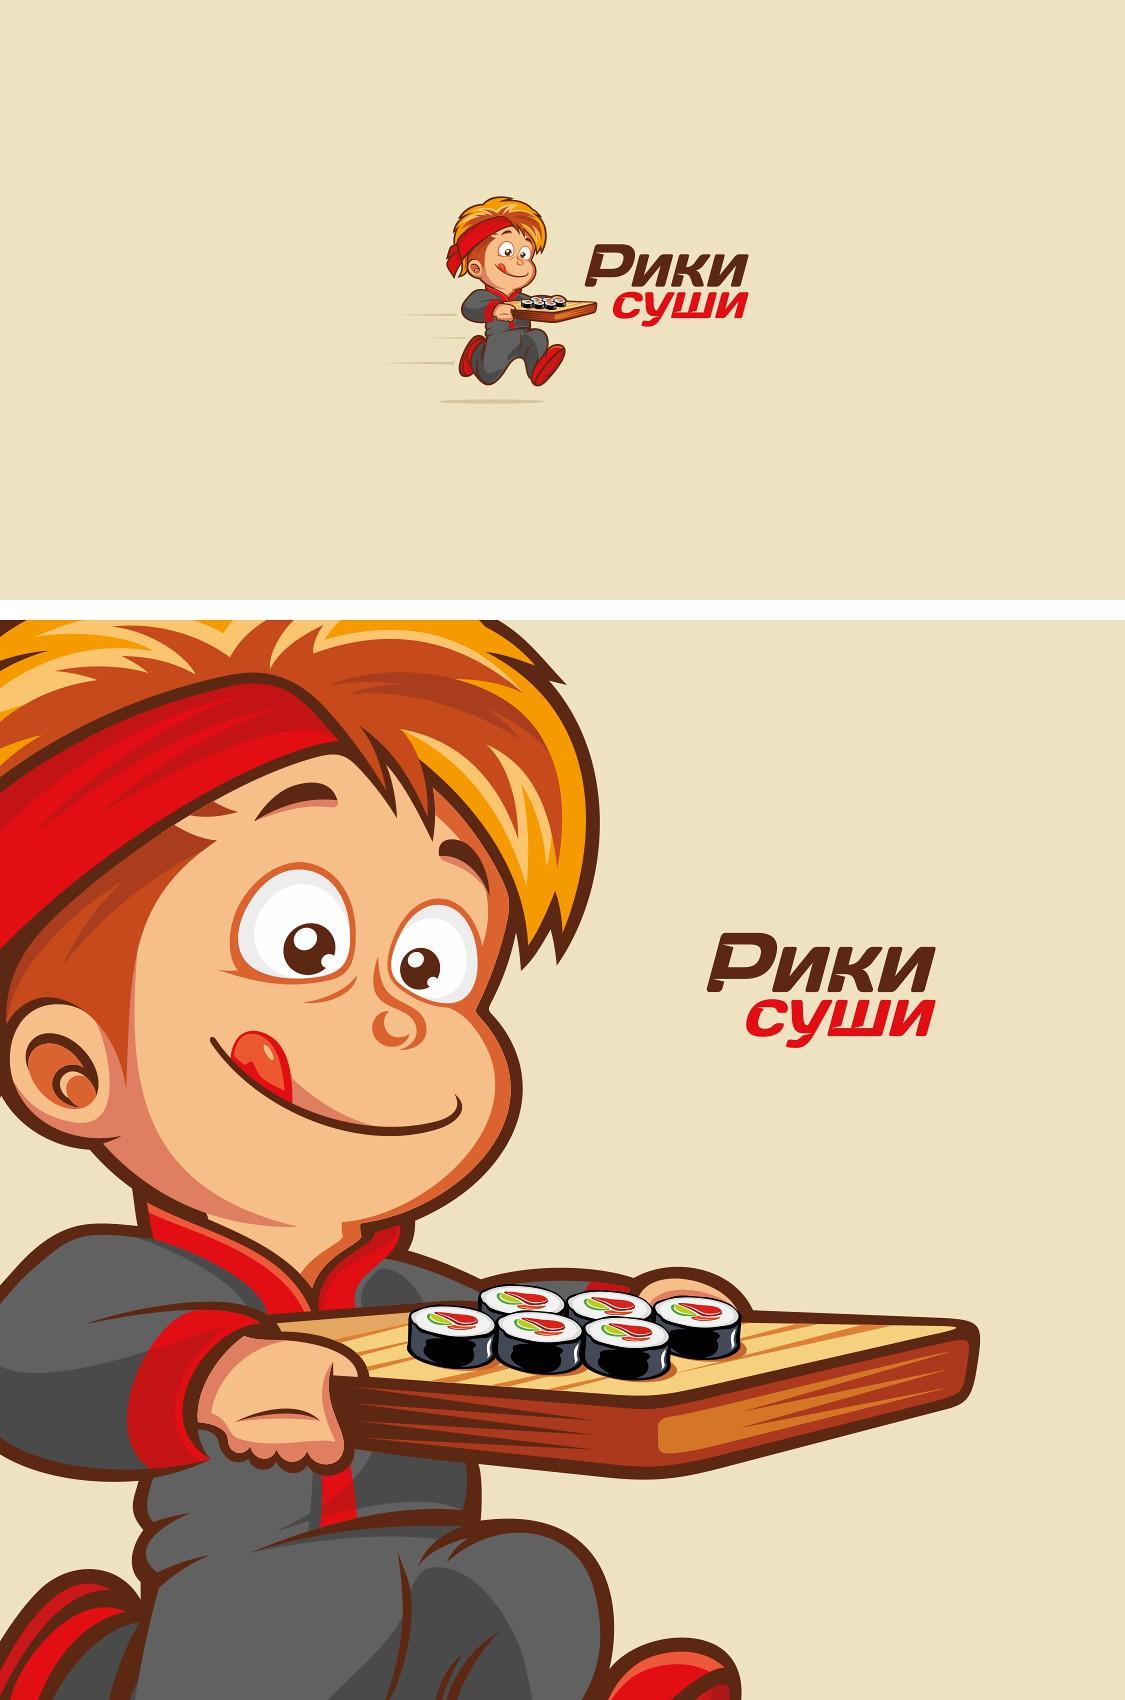 Рики суши